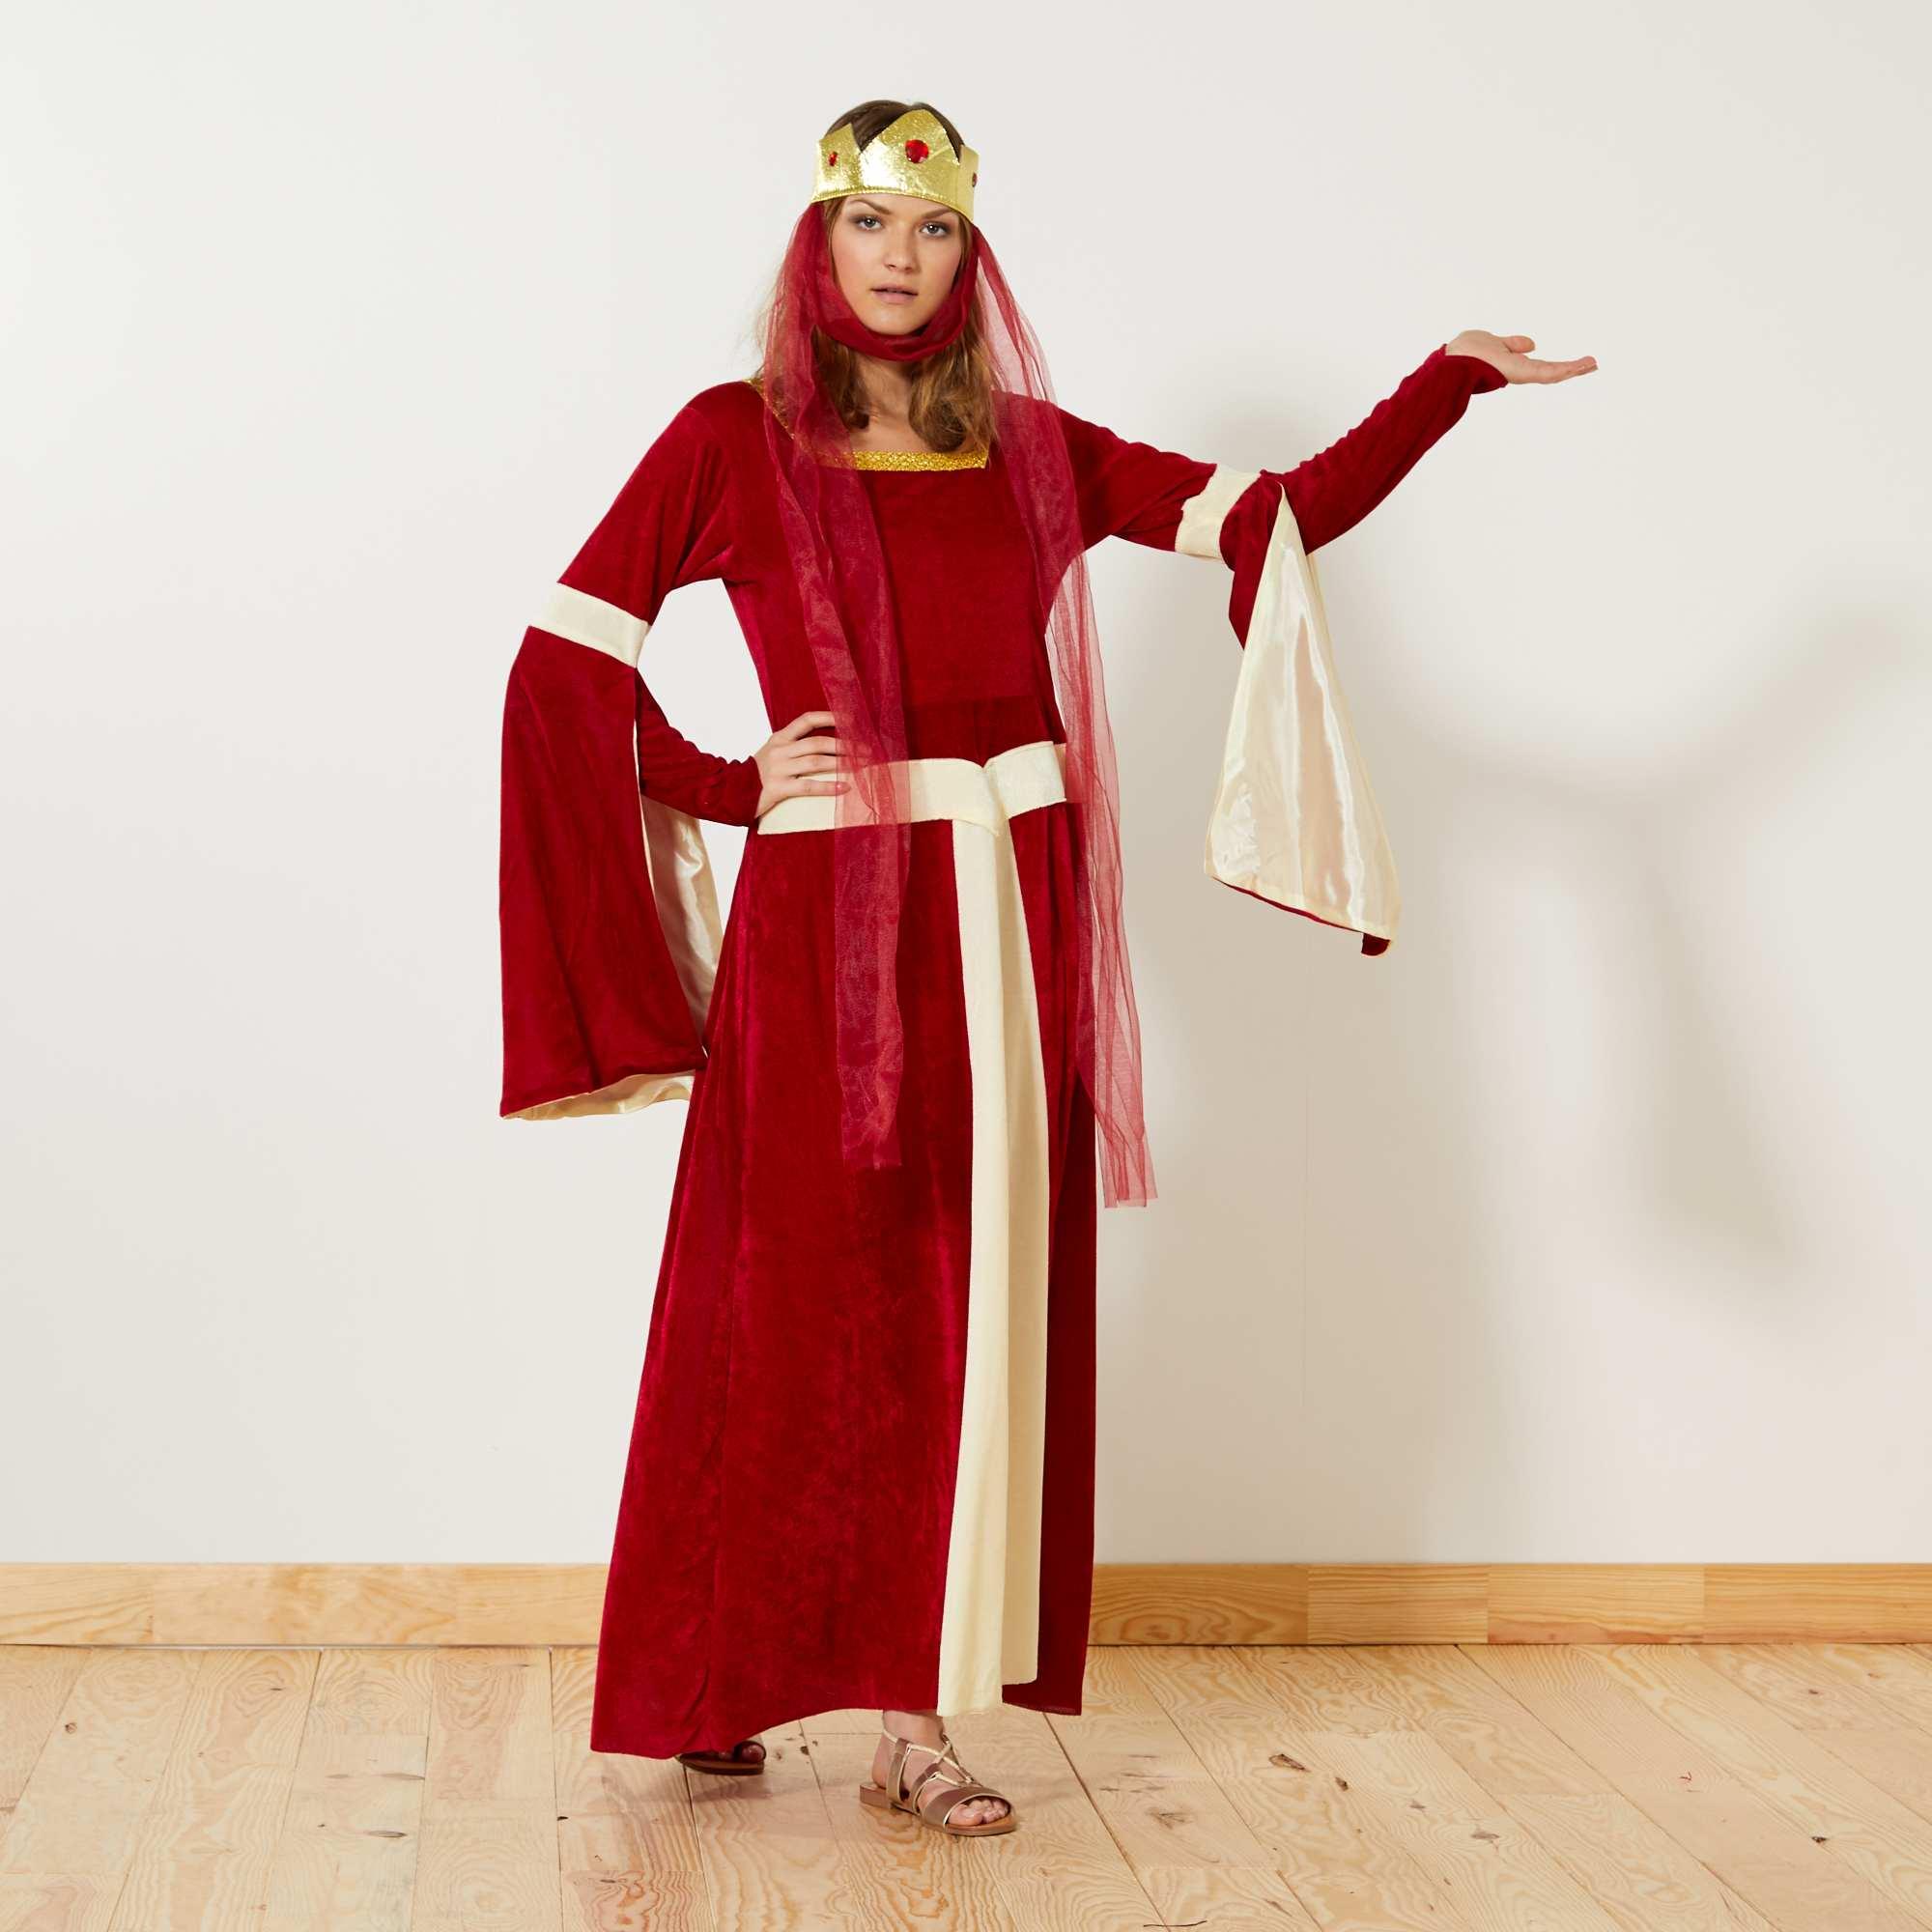 301353ae333 Déguisement de princesse médiévale Femme - rouge - Kiabi - 25